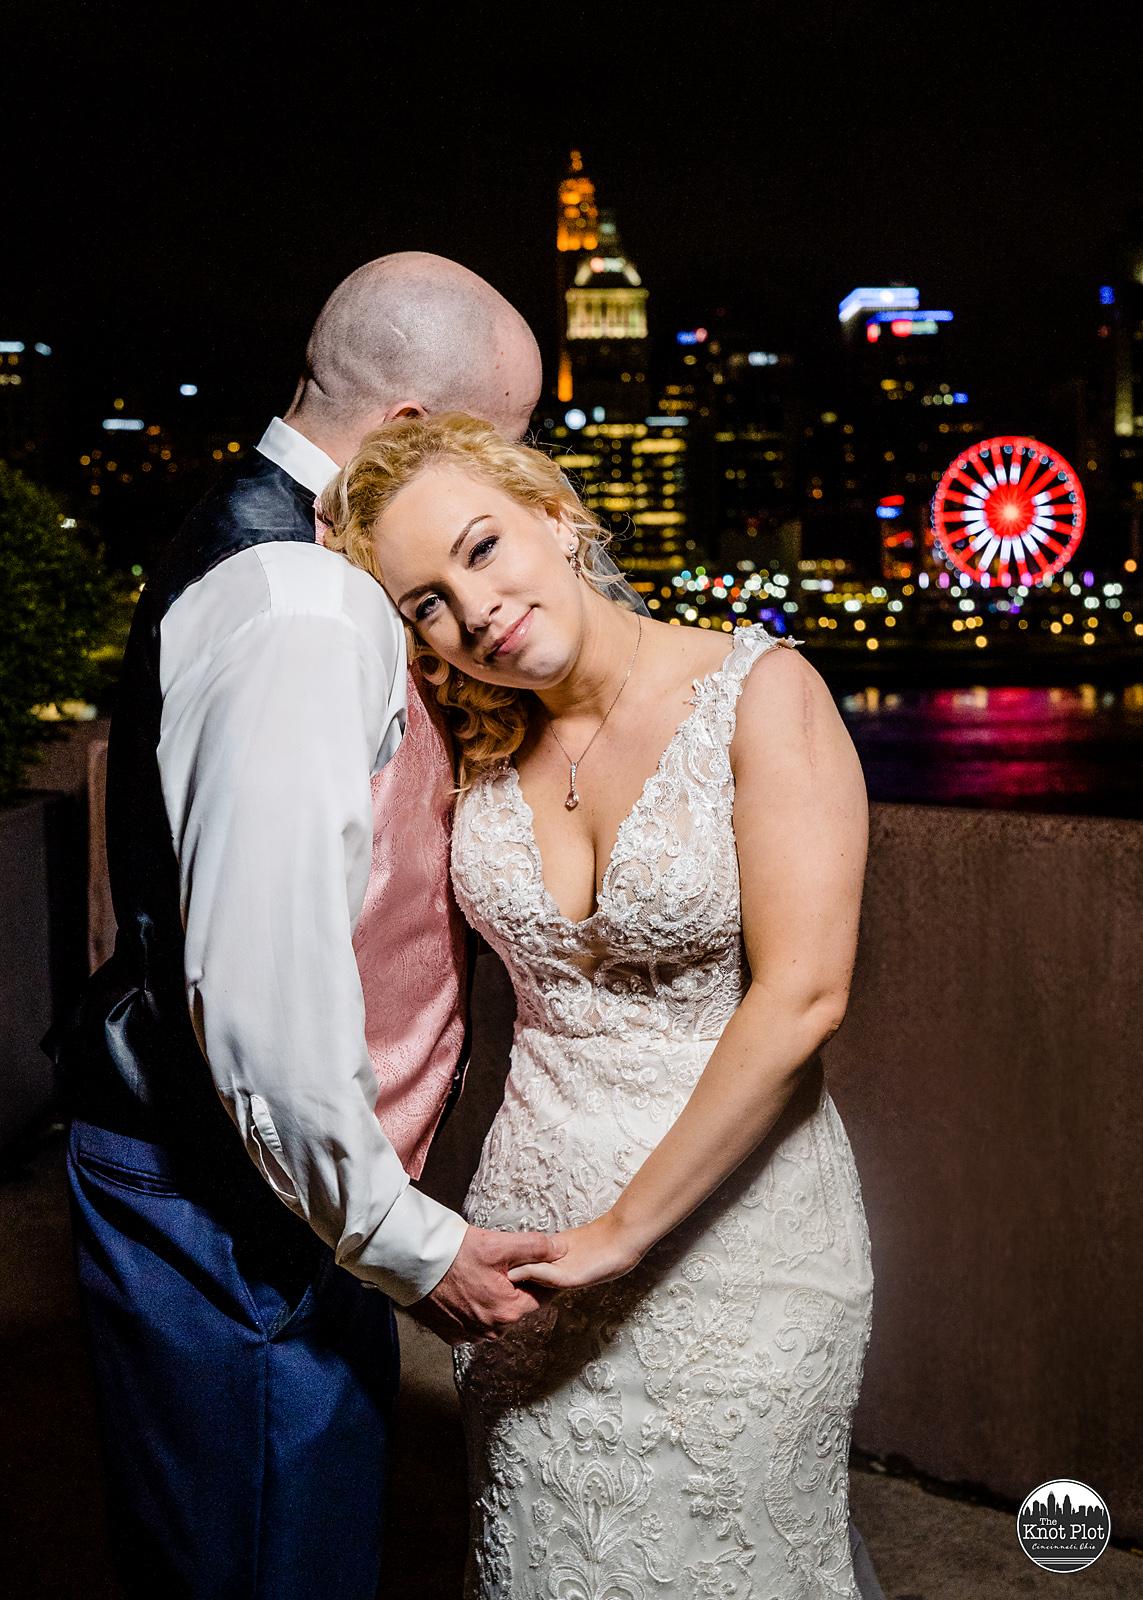 Embassy-Suites-Rivercenter-Cincinnati-Wedding-Photography-40.jpg